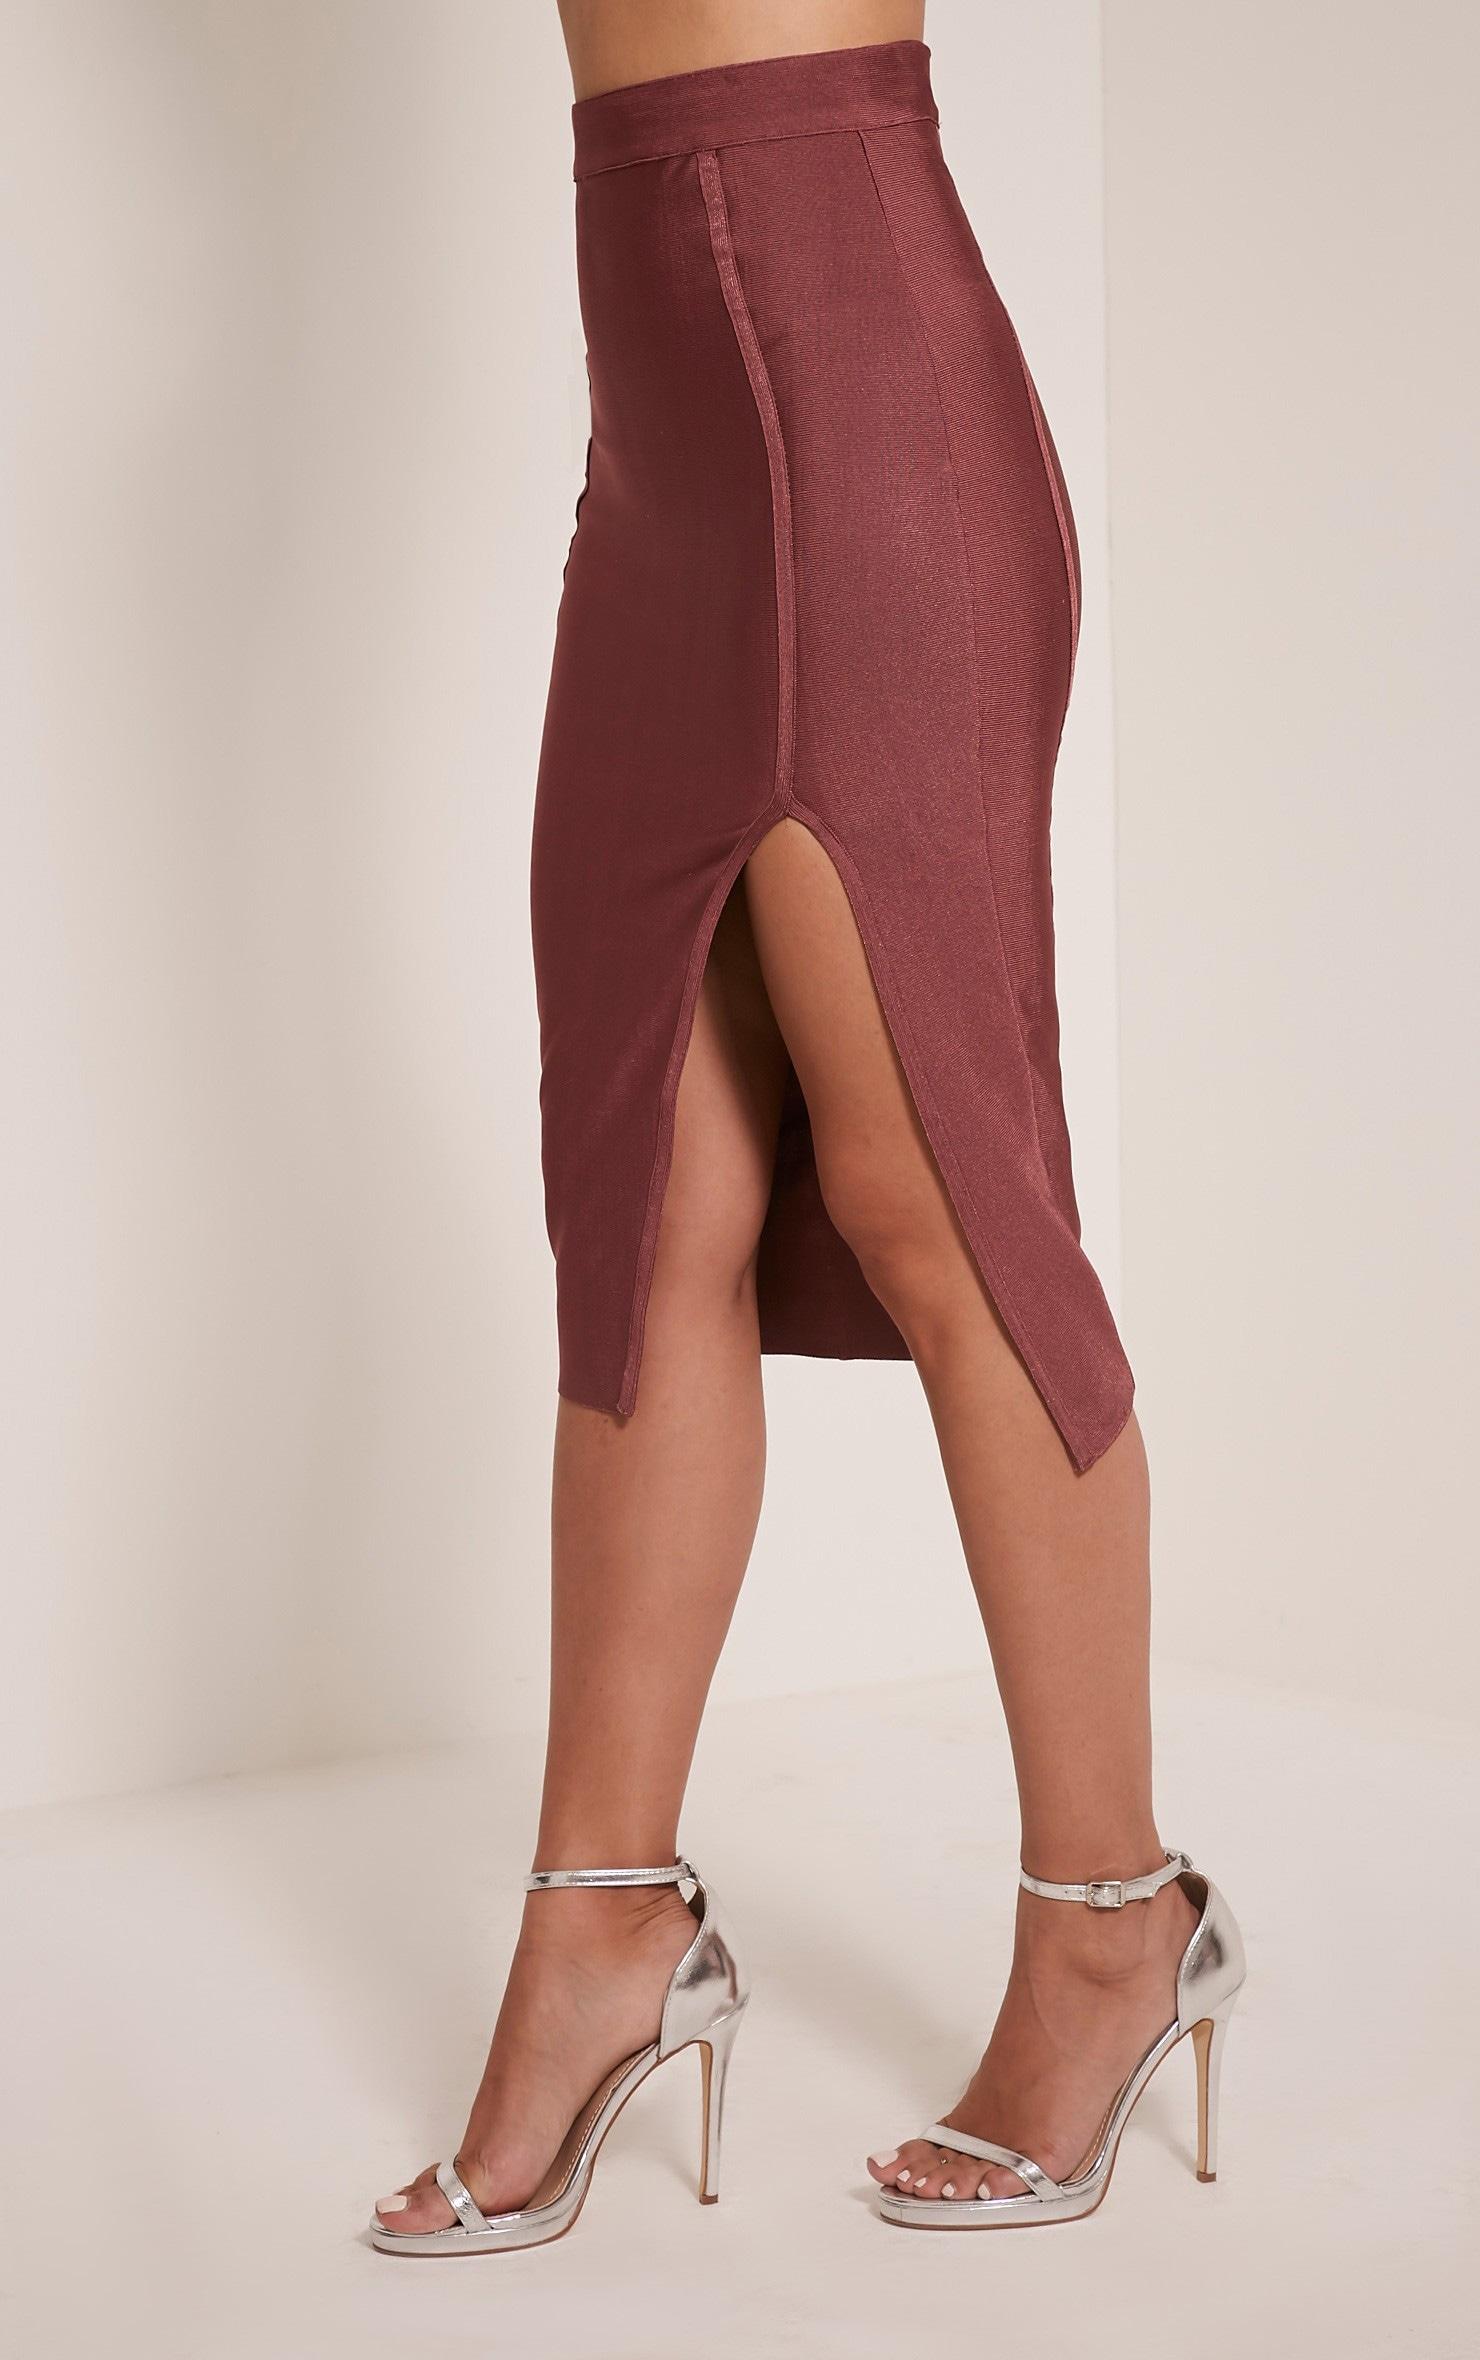 Caitlyn Premium jupe midi bandage rose 4